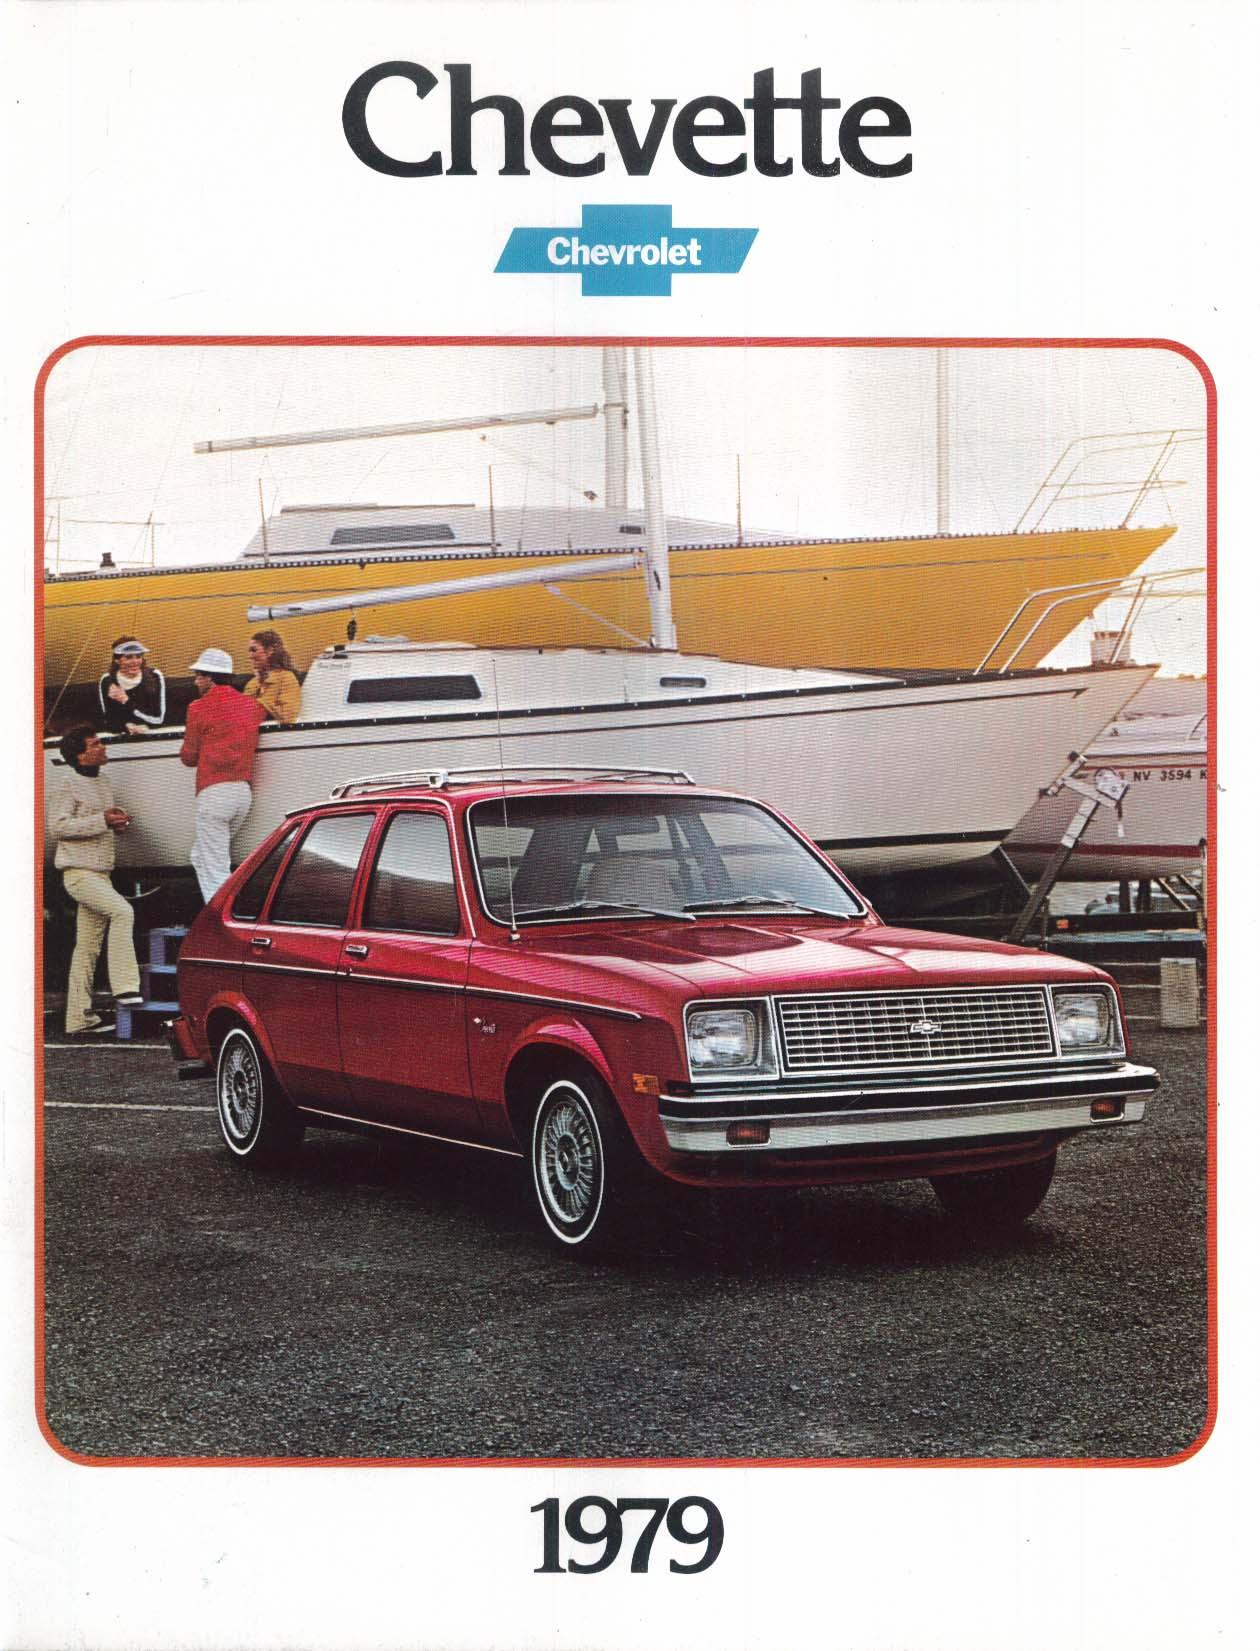 Image for 1979 Chevrolet Chevette sales brochure